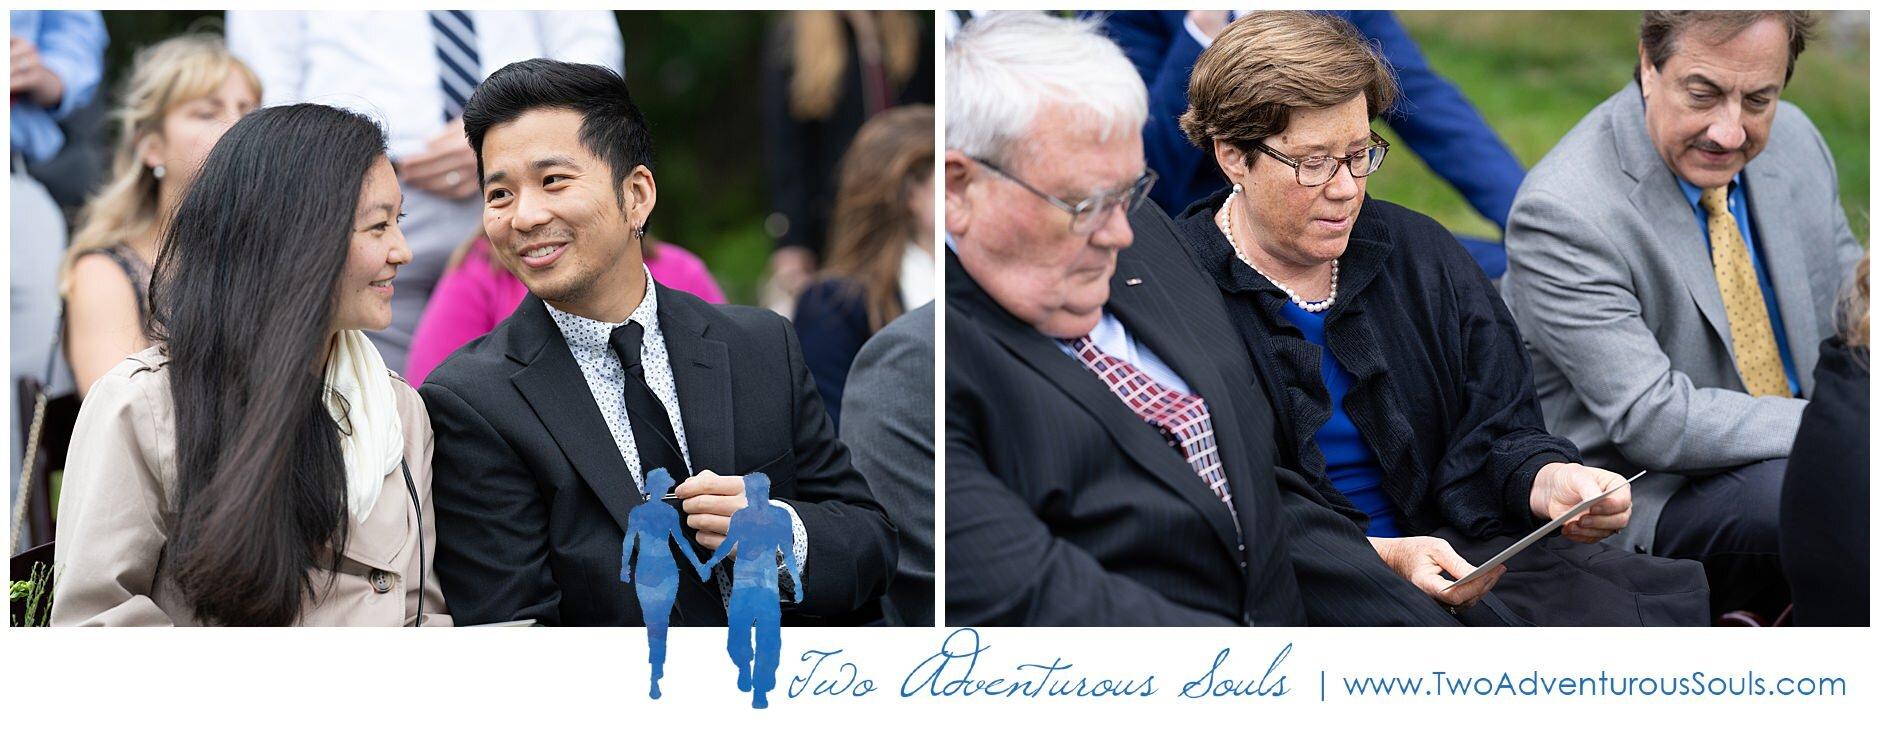 Bar Harbor Wedding Photographers, Acadia Bay Inn Wedding Photographers, Two Adventurous Souls- 091419_0018.jpg